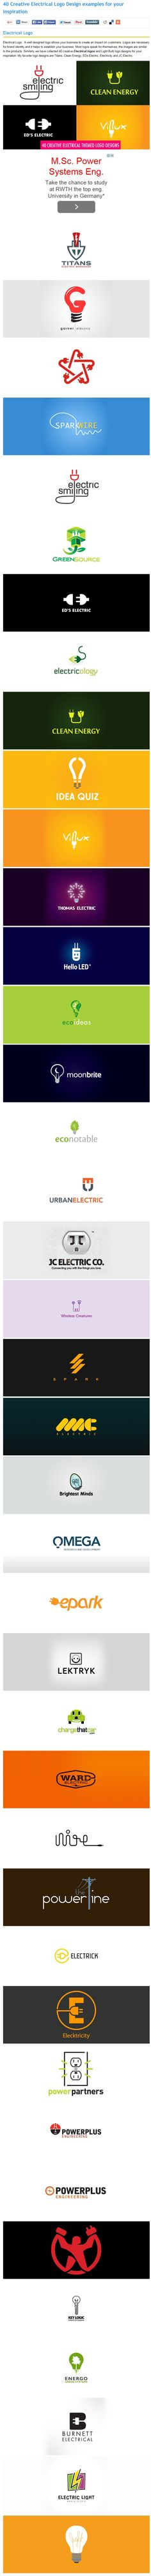 Electrical Logo Logos, Logo Branding, Flyer Design, Logo Design, Graphic Design, Electrician Logo, Cruise Party, Water Logo, Banksy